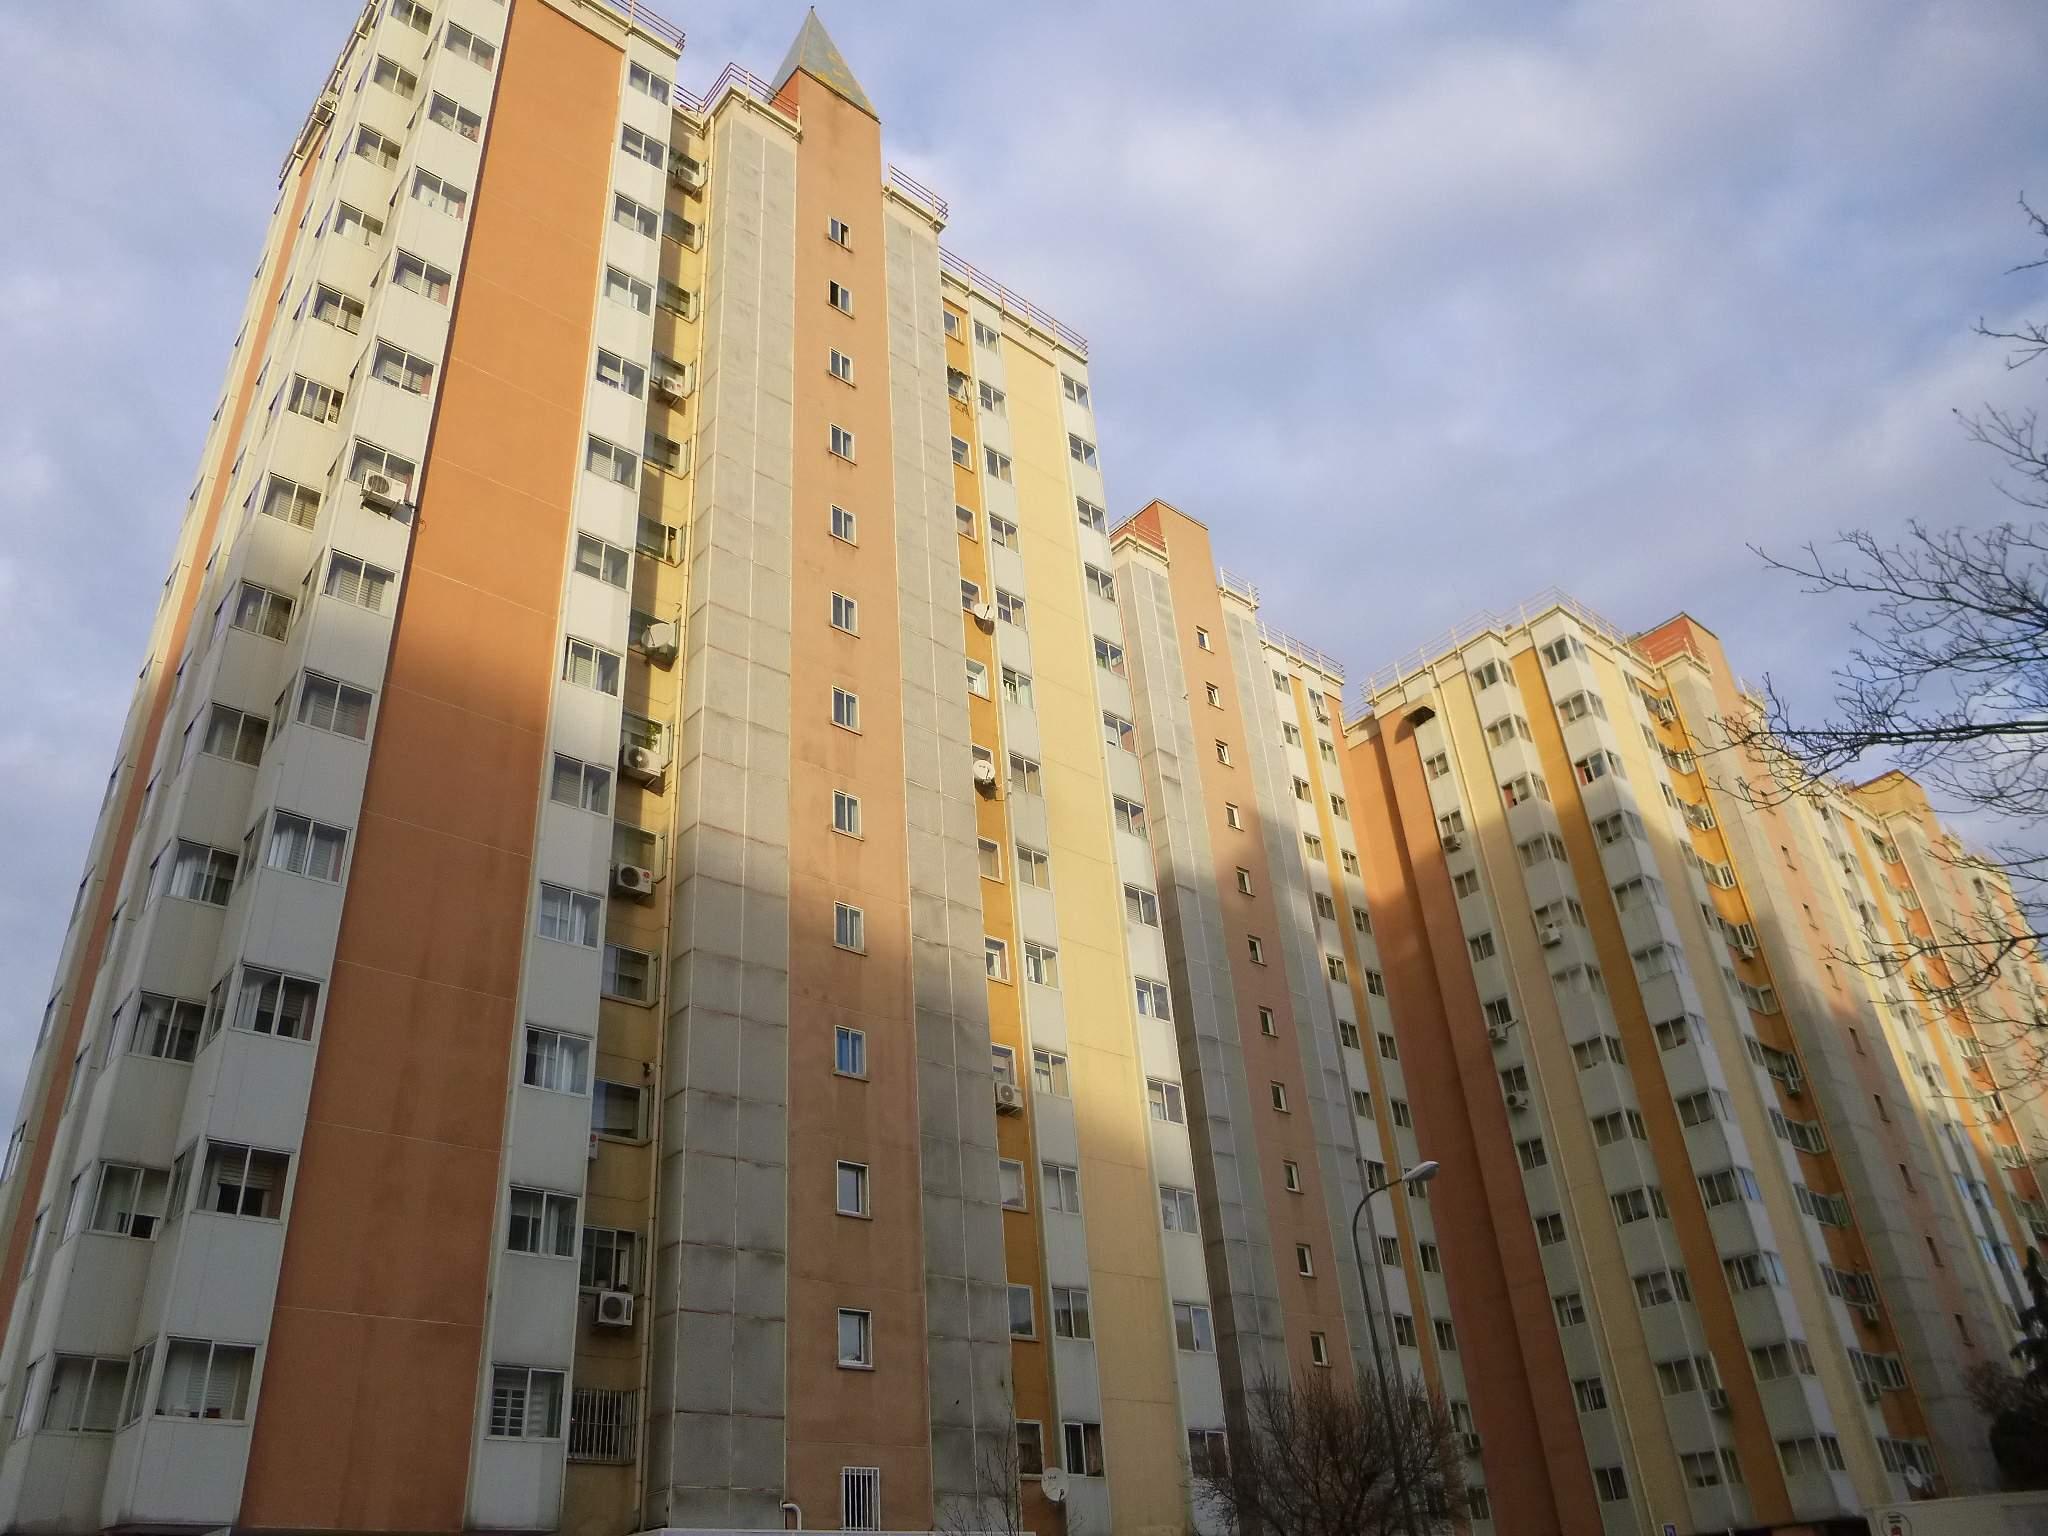 File:Madrid - Barrio de Pinar de Chamartín 5.JPG - Wikimedia Commons